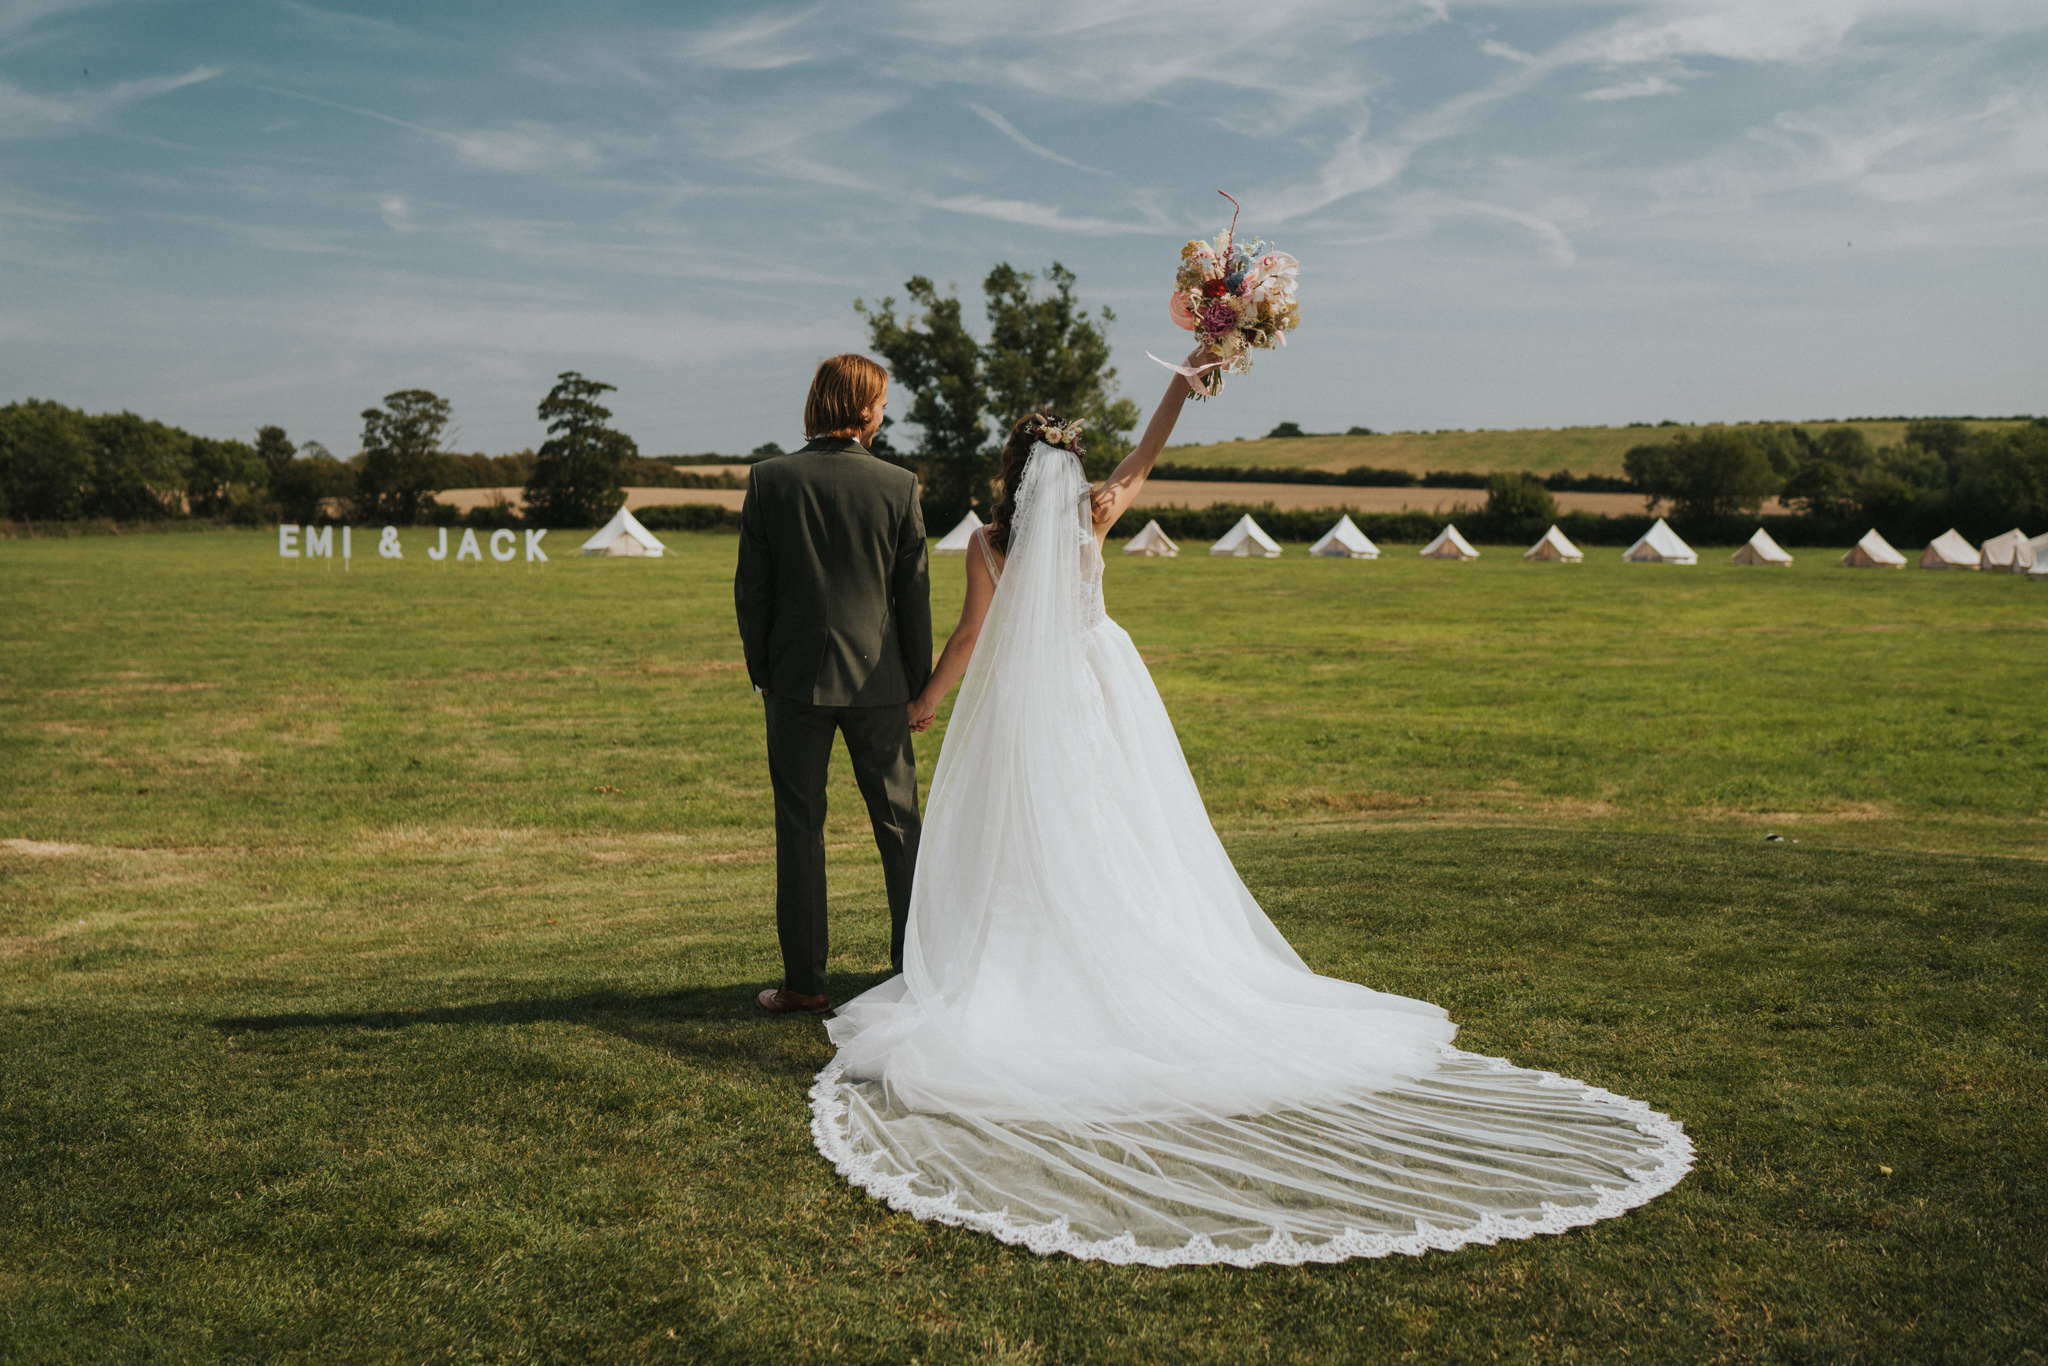 emi-Jack-boho-diy-wedding-eggington-house-grace-elizabeth-colchester-essex-alternative-wedding-photographer-suffolk-norfolk-devon (30 of 56).jpg